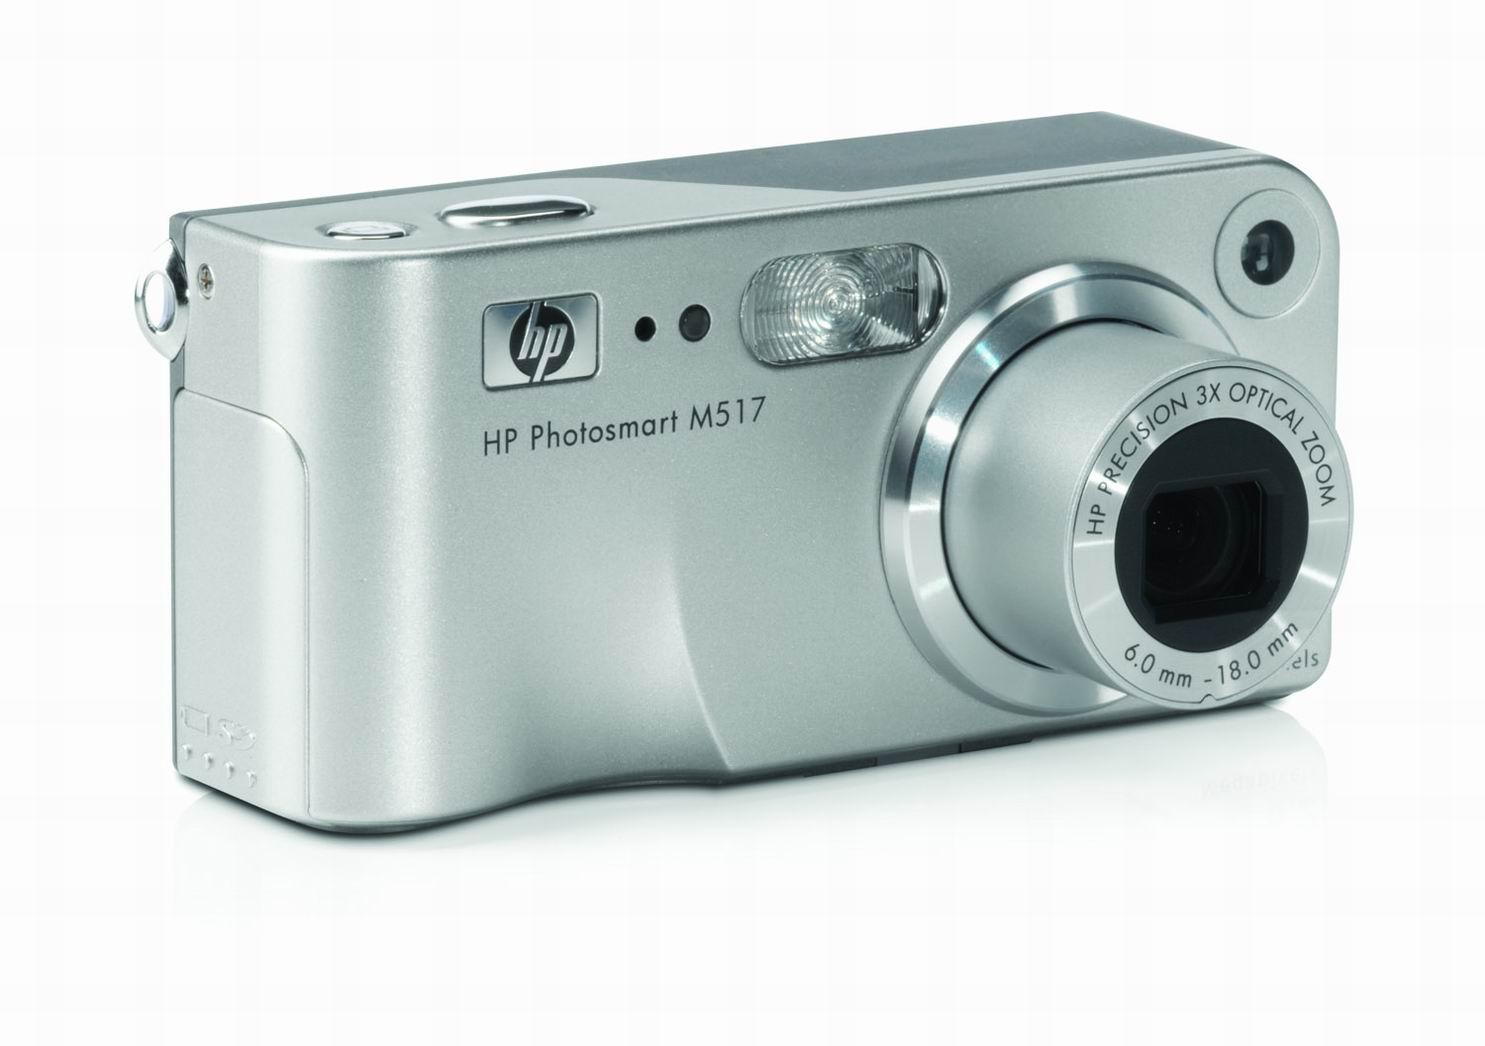 Cellulari fotocamera 5 megapixel prezzi 70